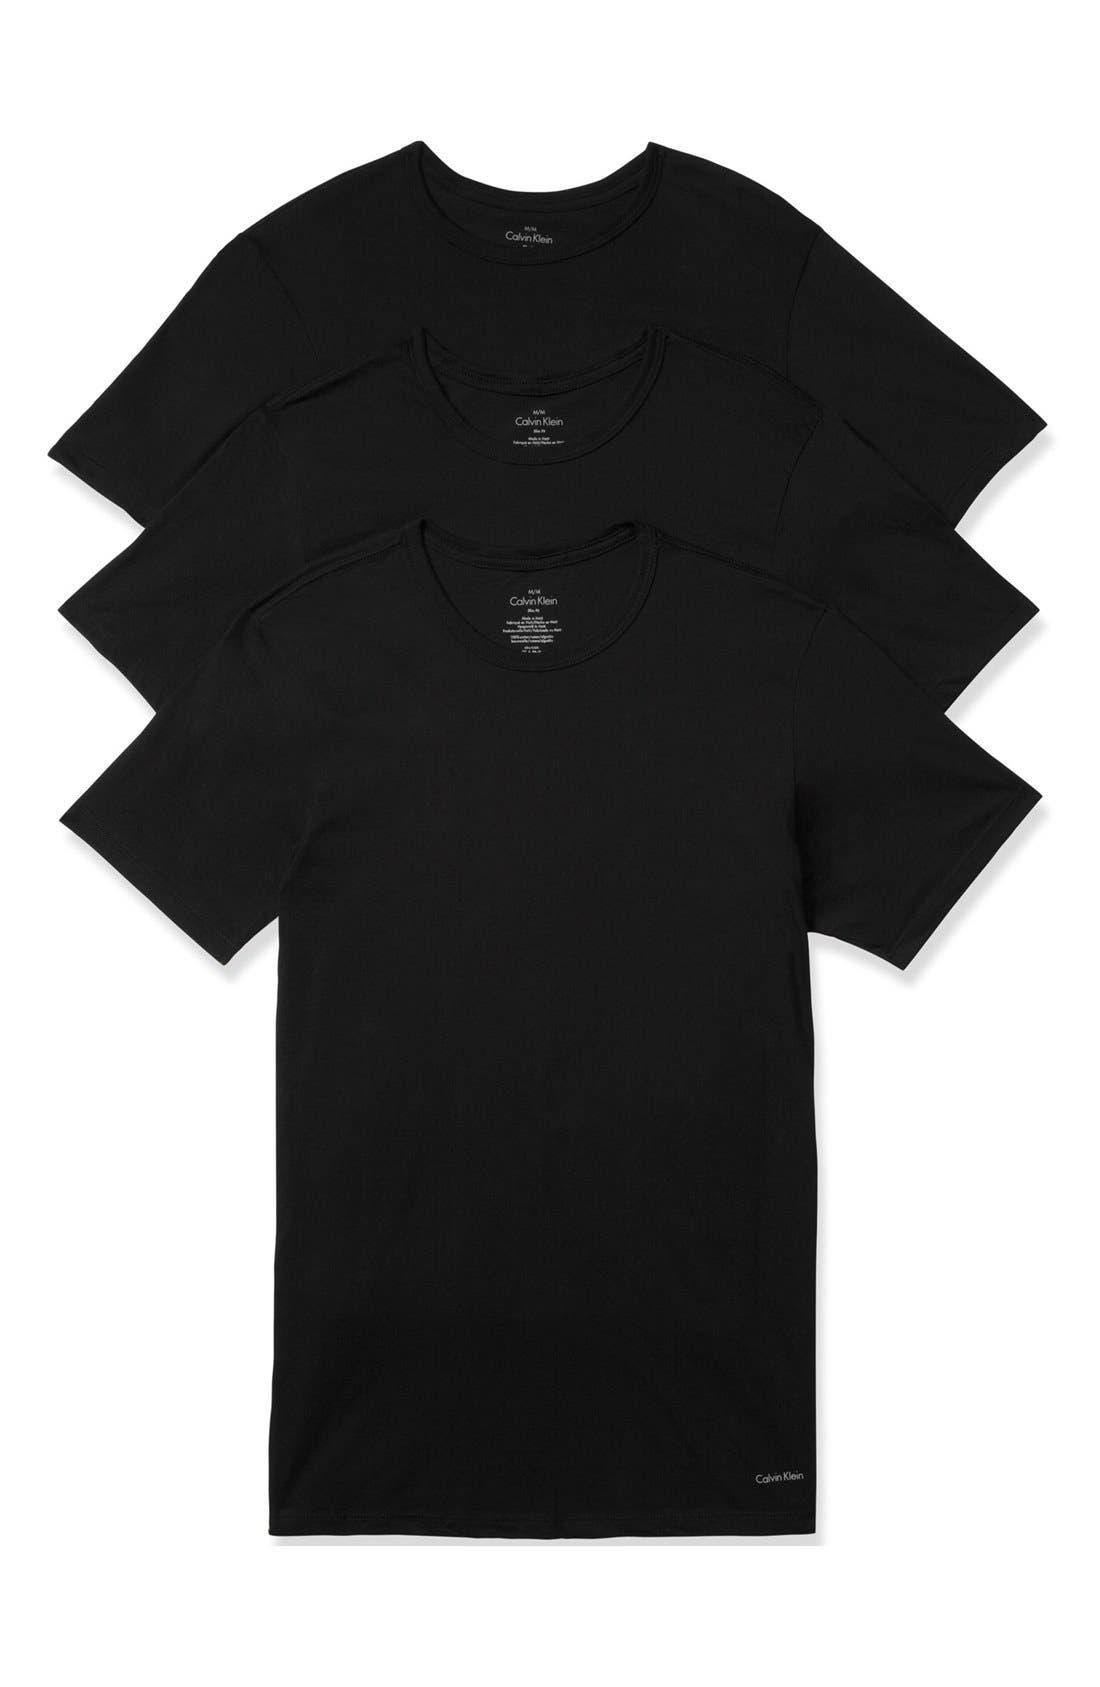 Main Image - Calvin Klein Slim Fit 3-Pack Cotton T-Shirt